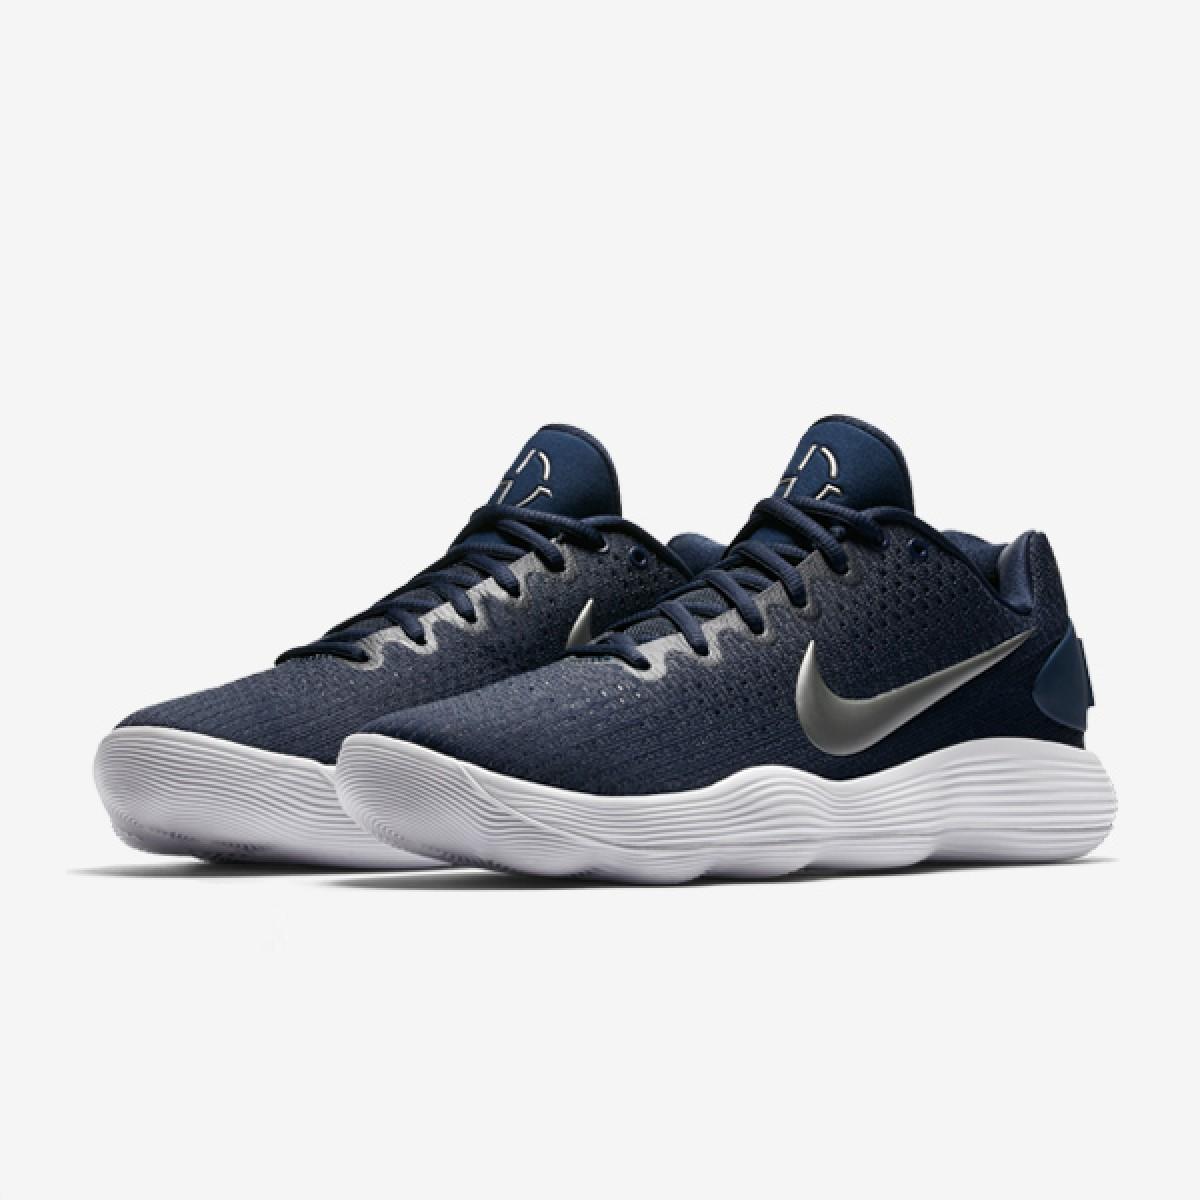 Nike Hyperdunk 2017 Low 'Navy' 897807-400